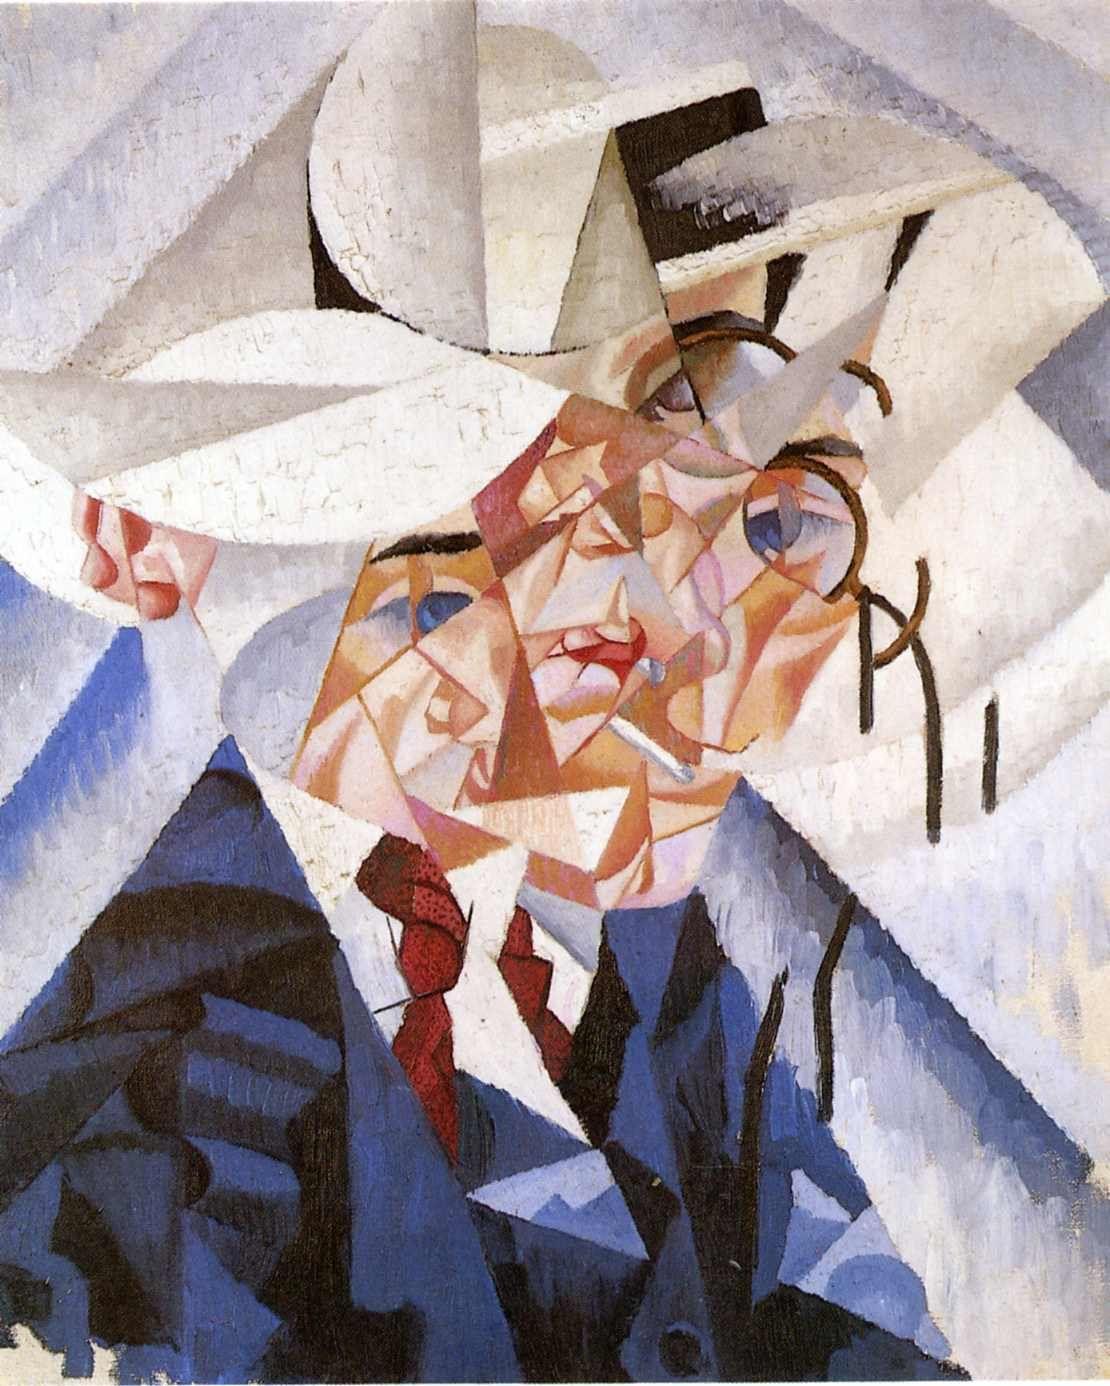 gino severini futurist artist | Self-portrait - Gino Severini - WikiPaintings.org